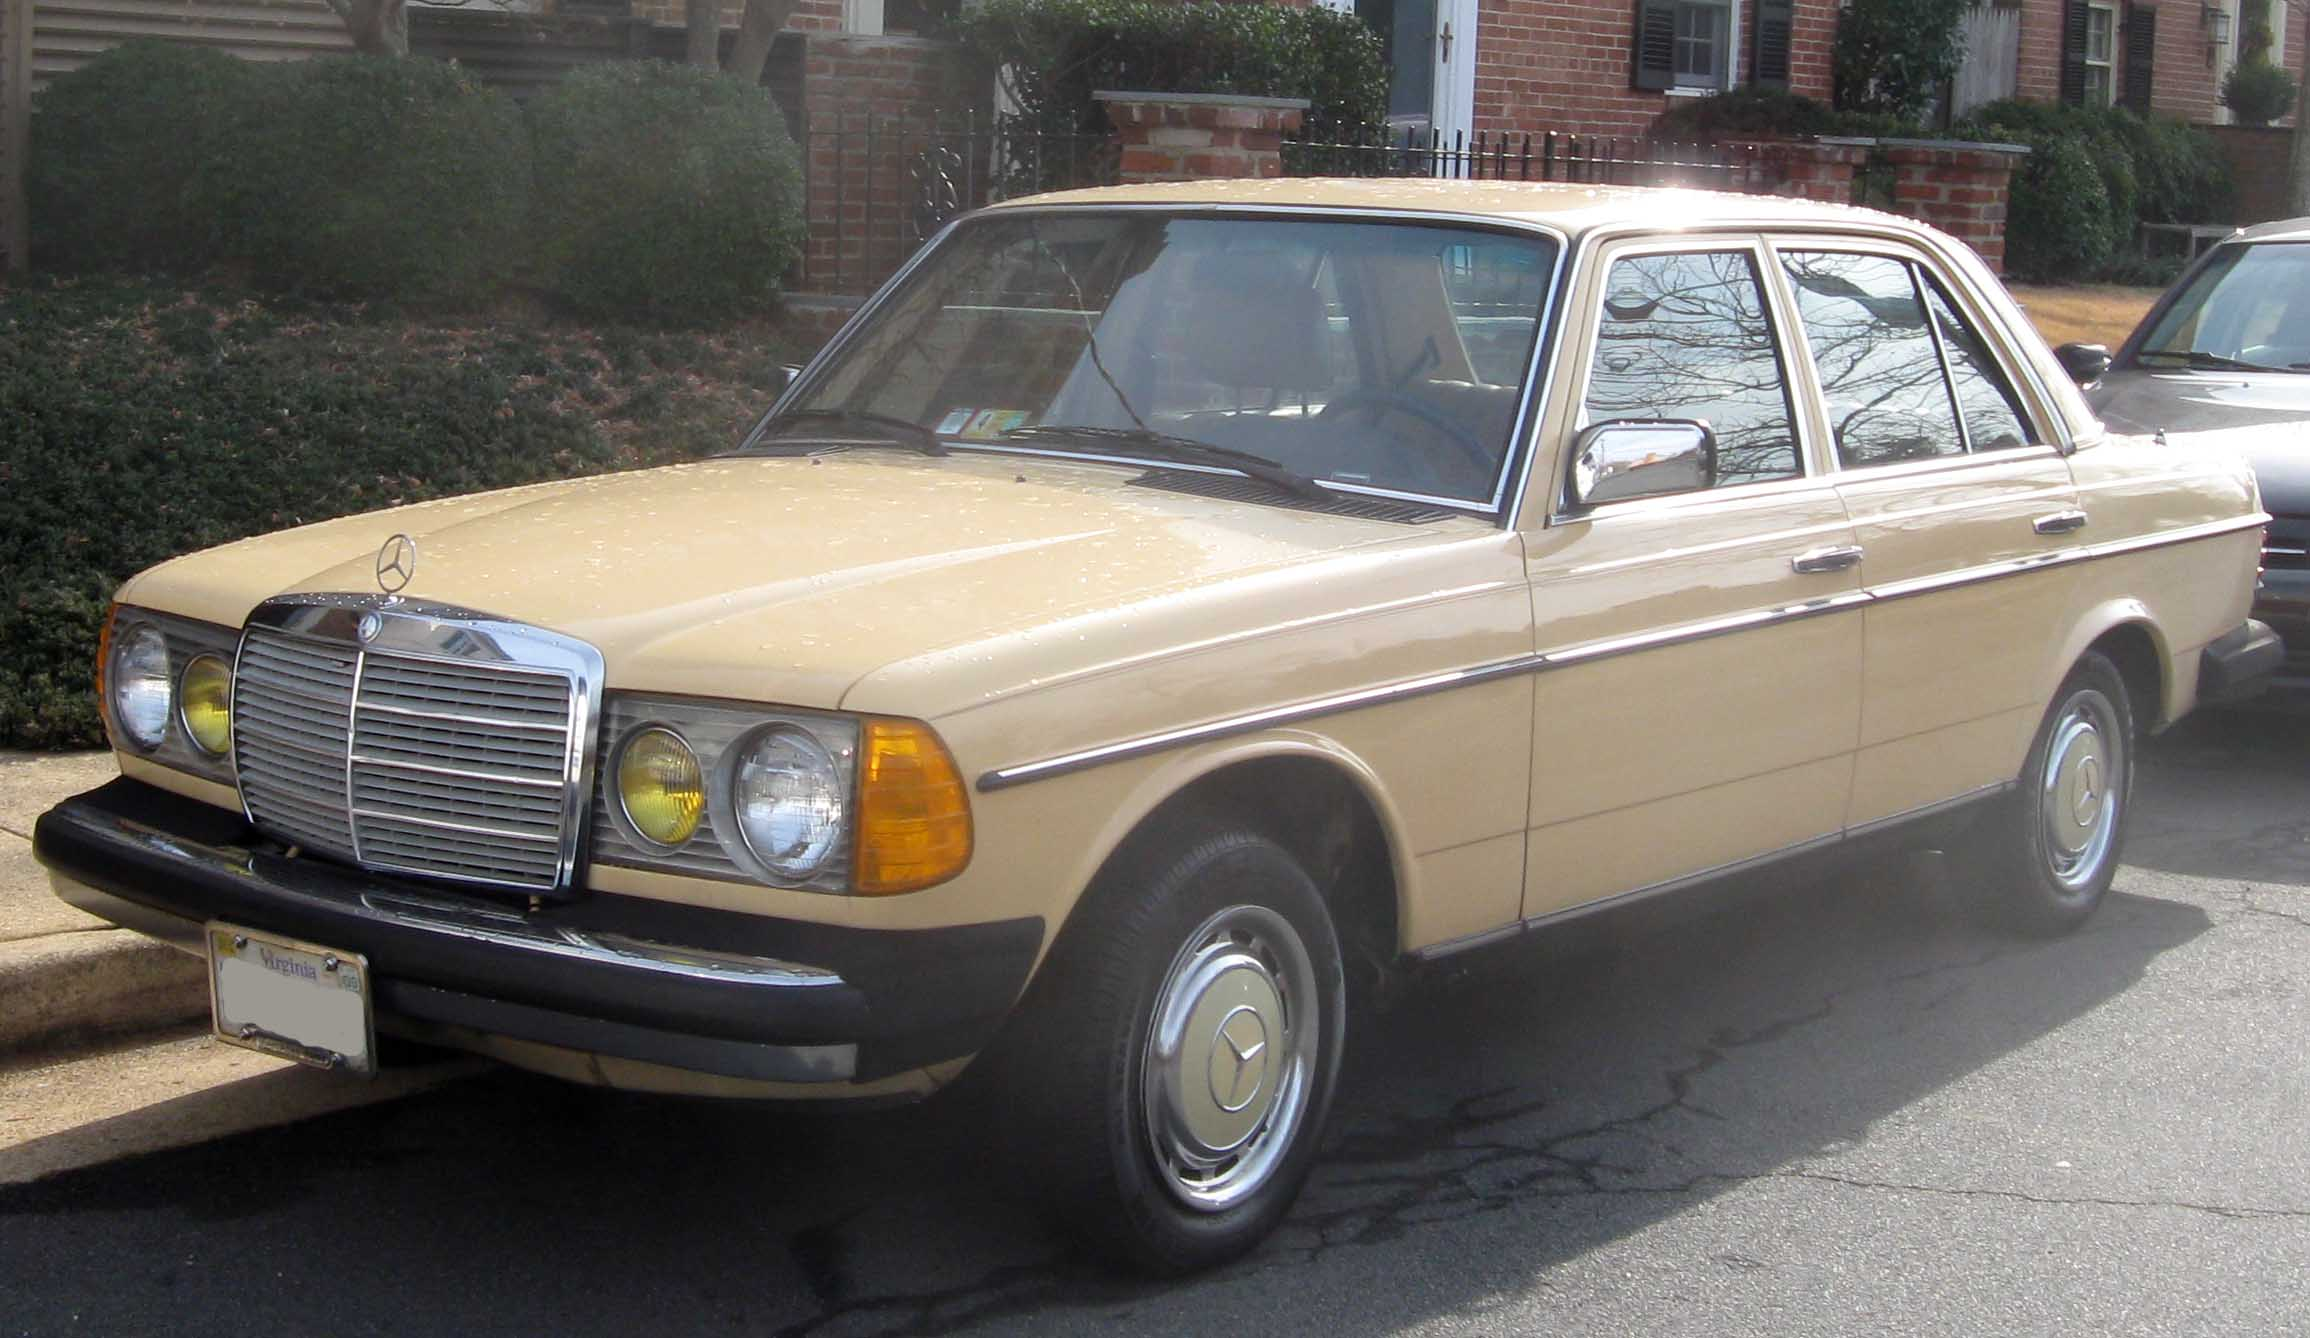 Mercedes-Benz W123 1975 - 1985 Station wagon 5 door #5